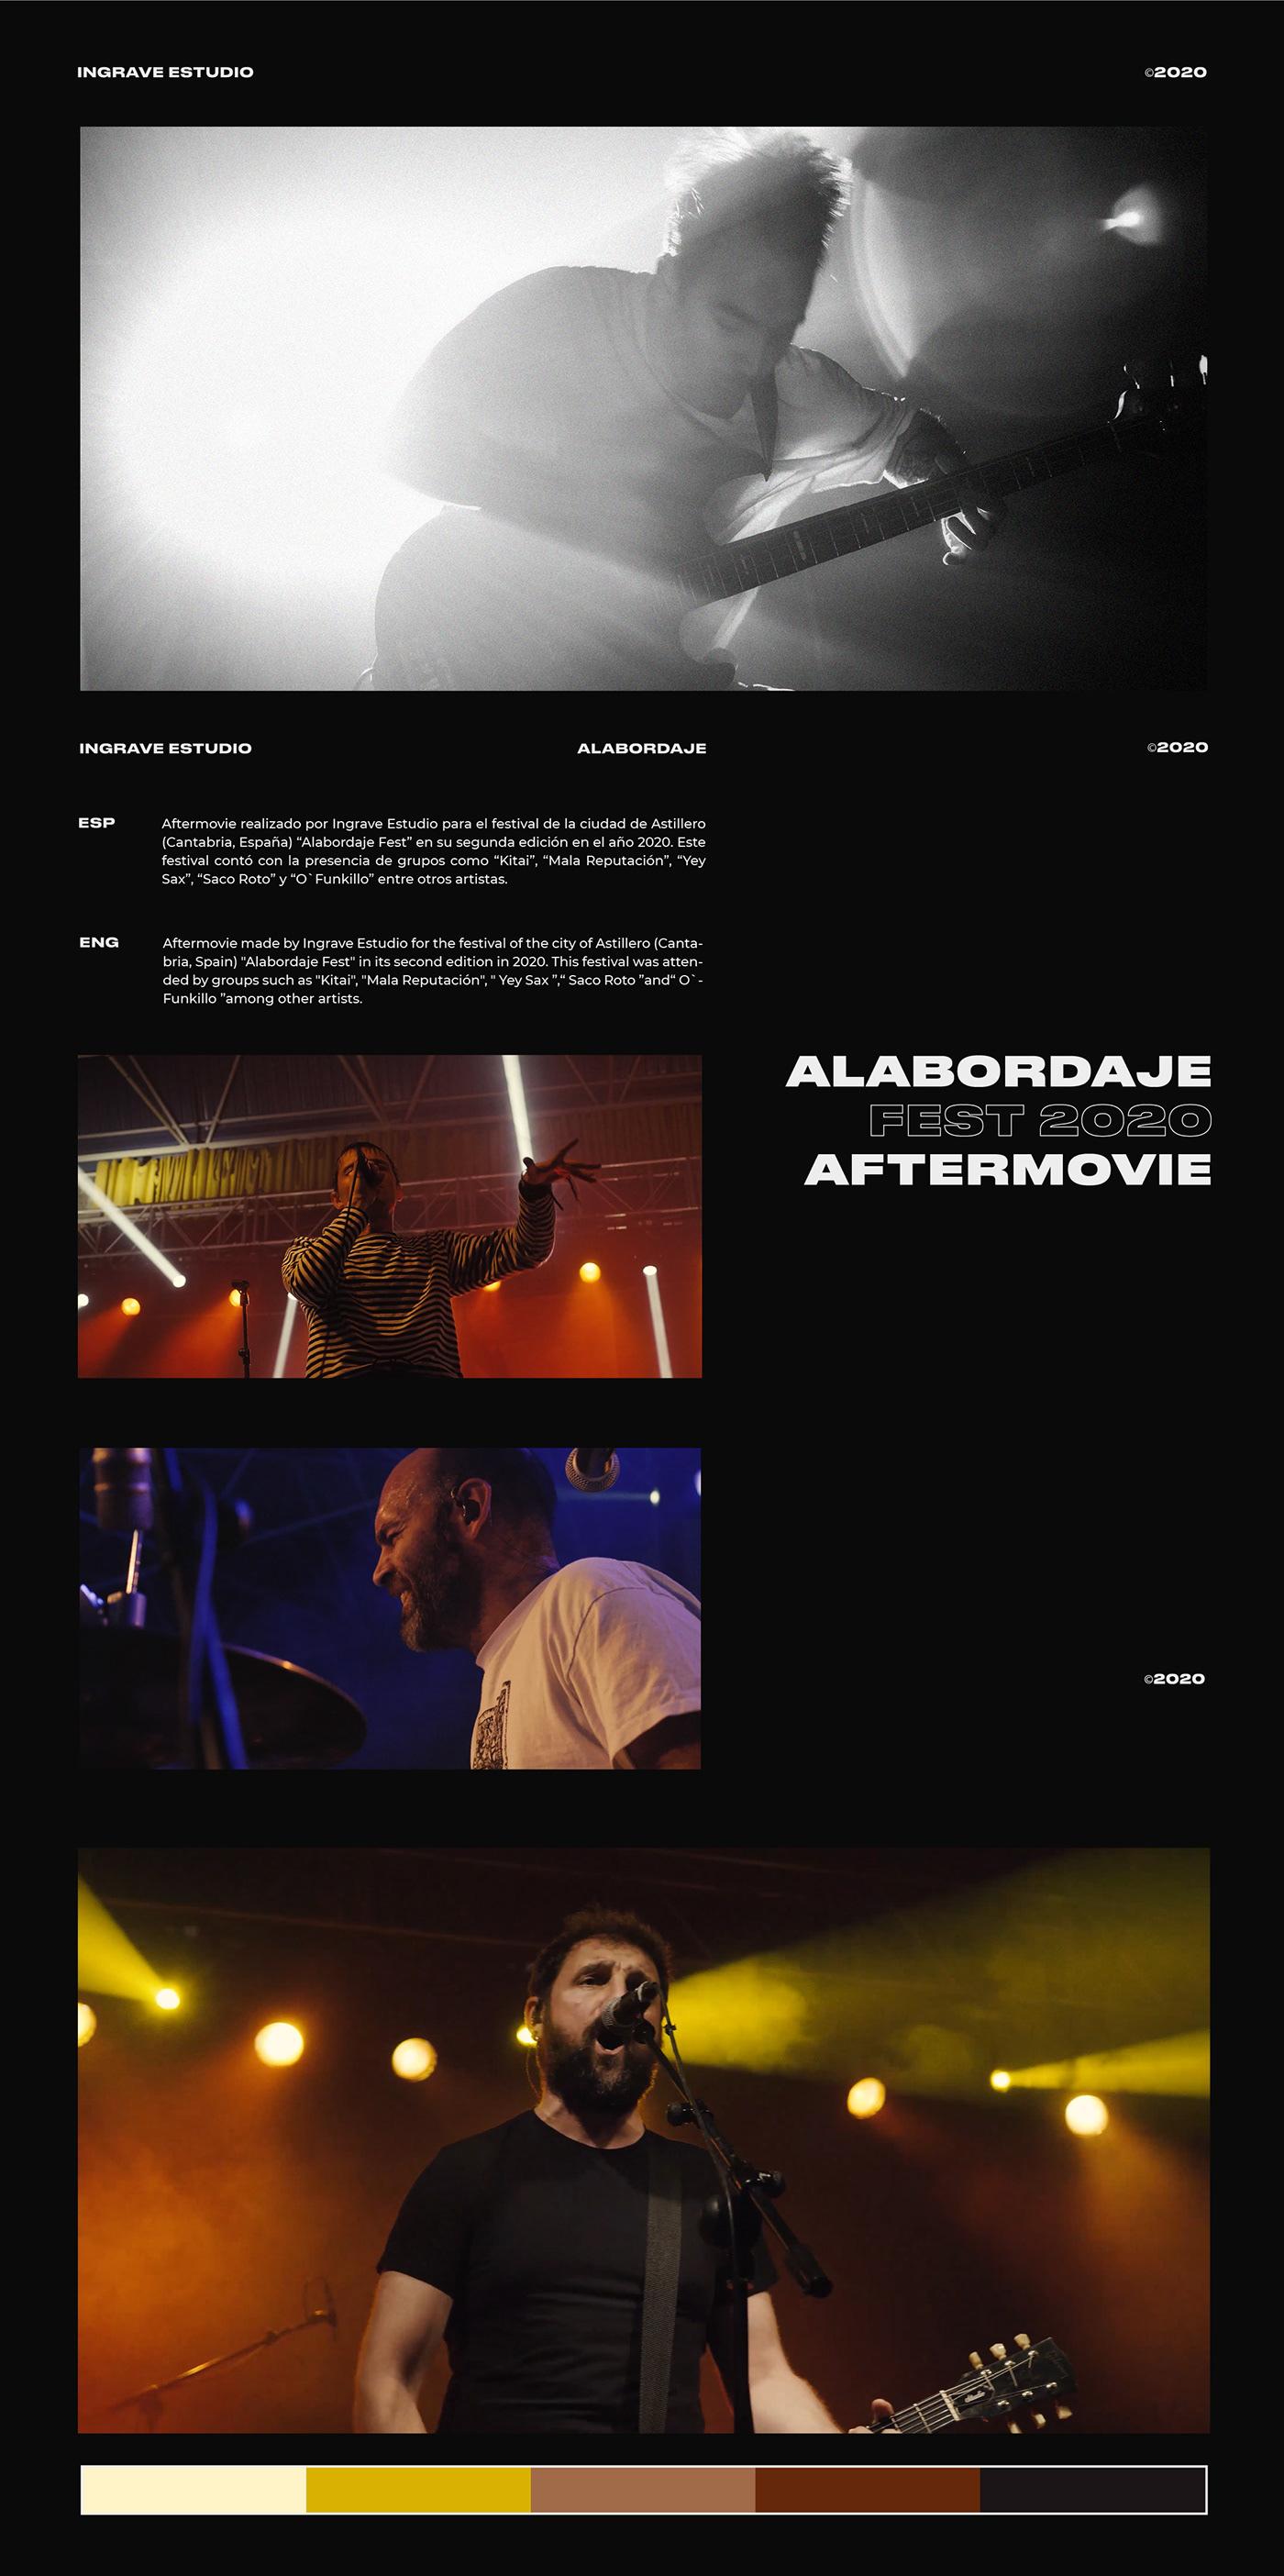 Aftermovie fest festival Filmmaker filmmaking music video reel video